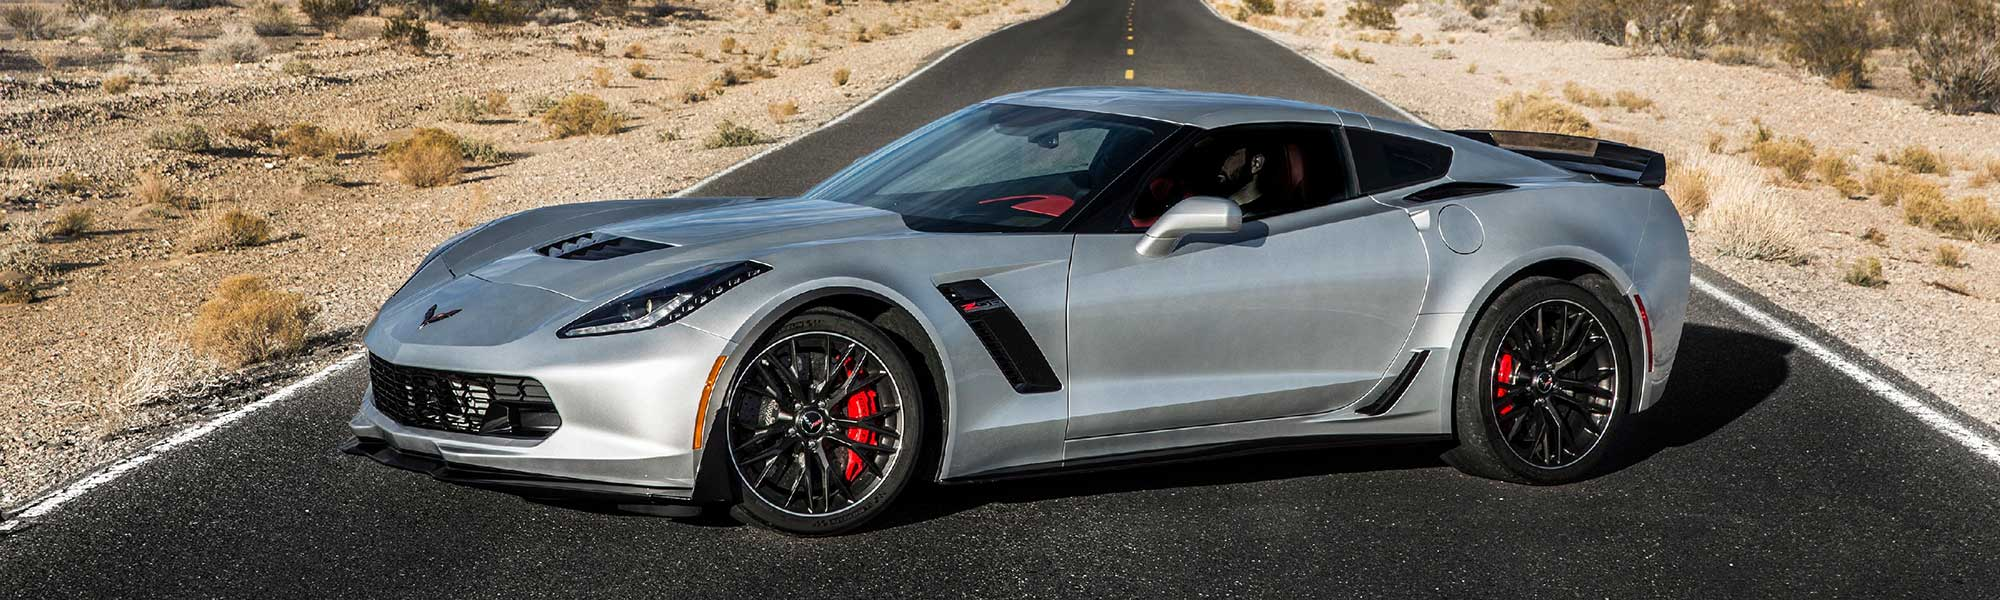 Corvette Z06 von 2016